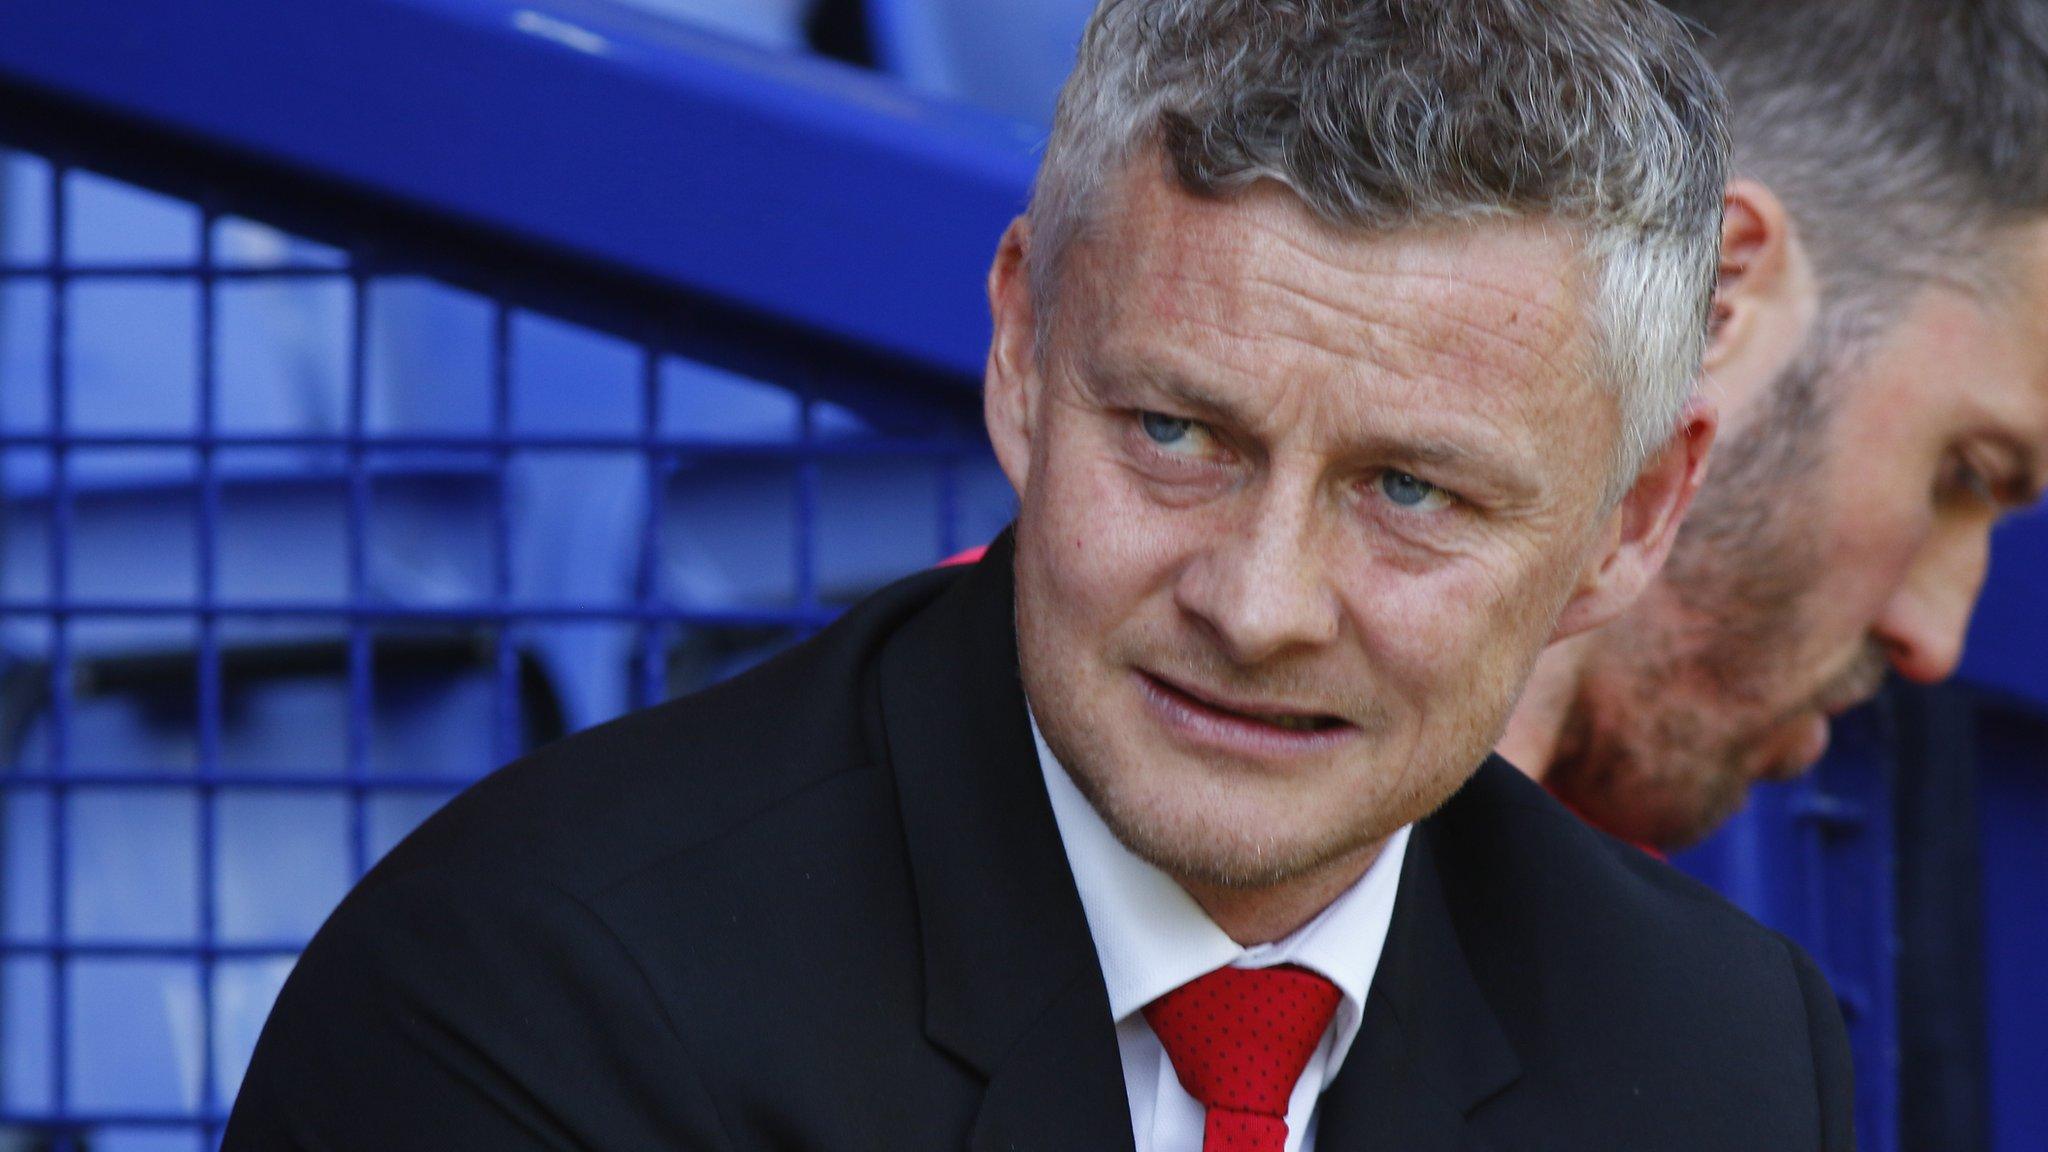 Many of my players have 'Man Utd DNA', insists Solskjaer